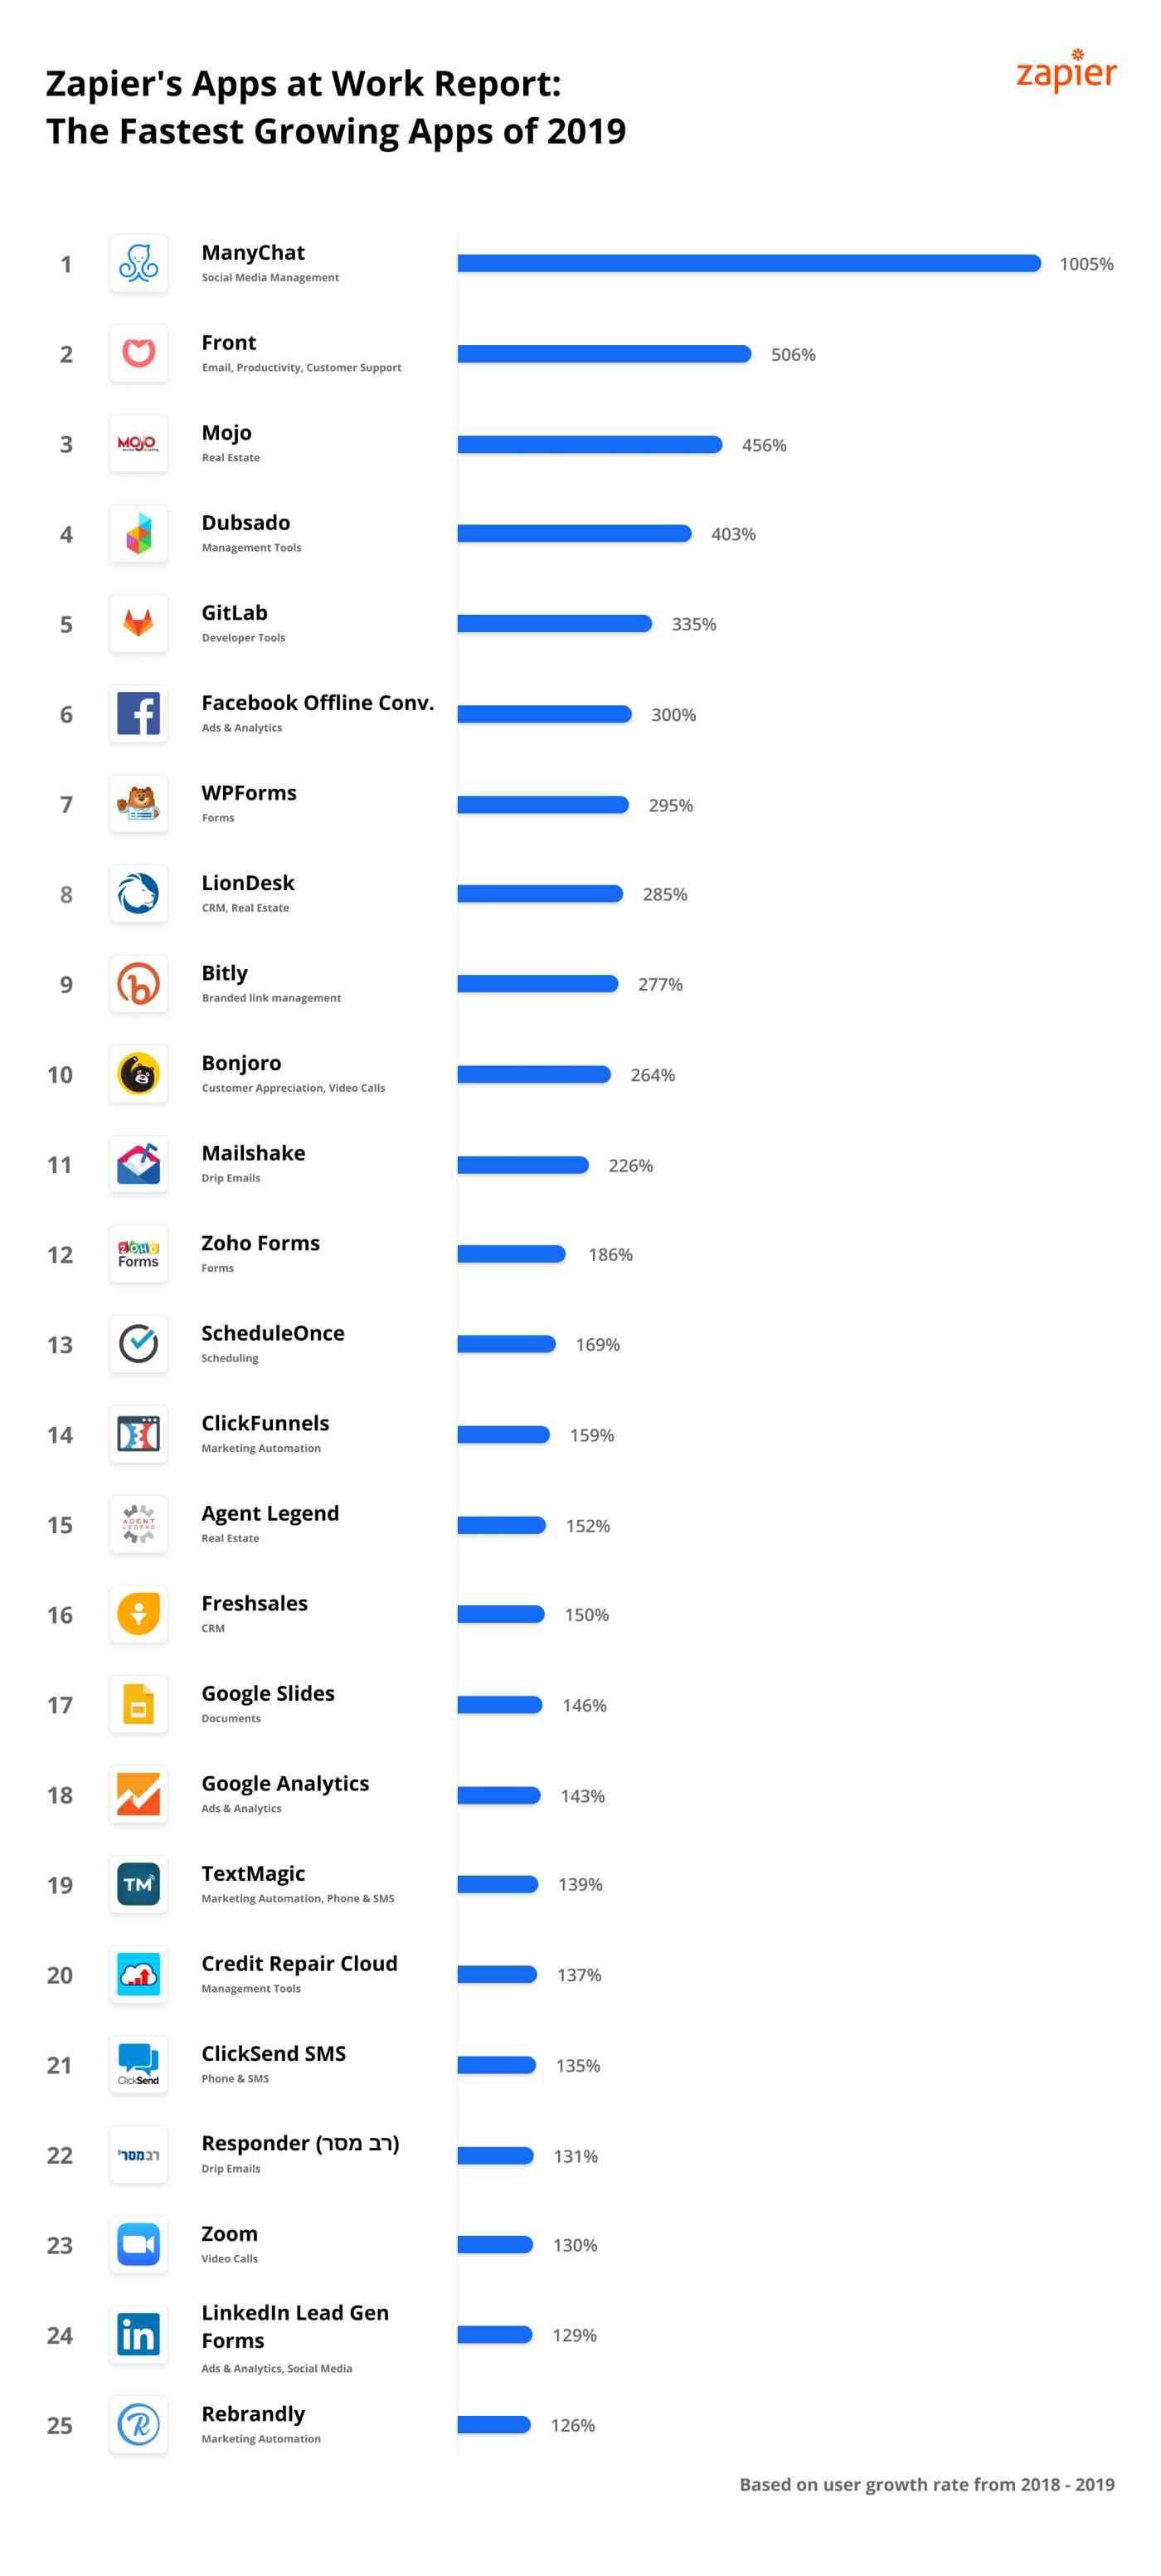 Zapier Fastest Growing Apps 2019: ManyChat, Front, Mojo, Dubsado, GitLab, Facebook Offline Conversion, WPForms, LionDesk, Bitly, Bonjoro